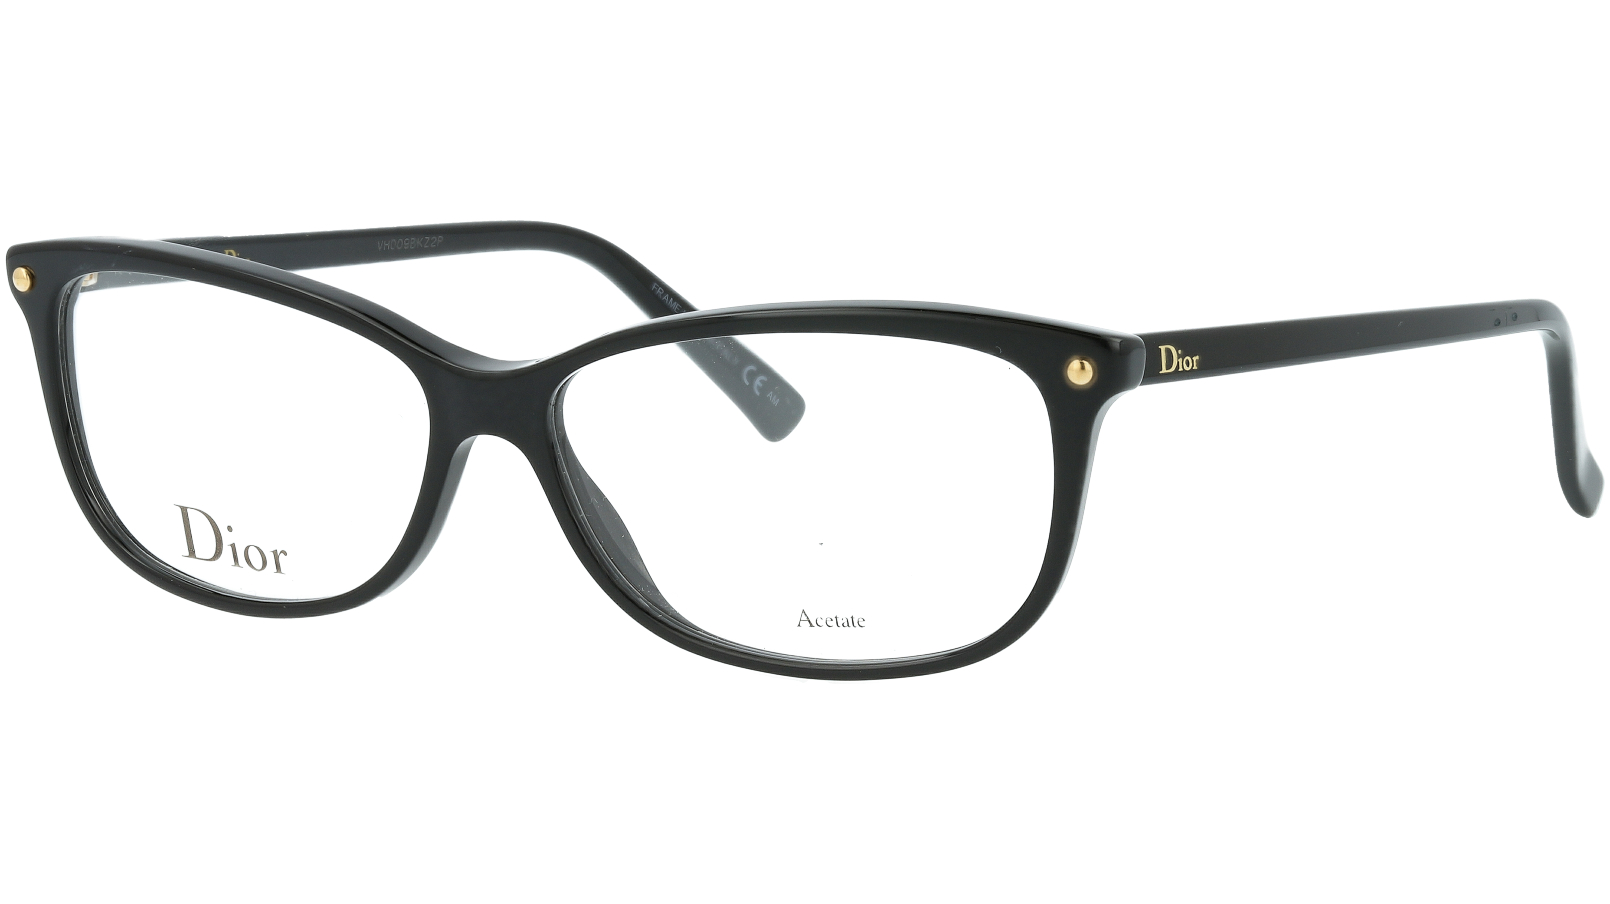 DIOR CD3271 807 53 BLACK Glasses